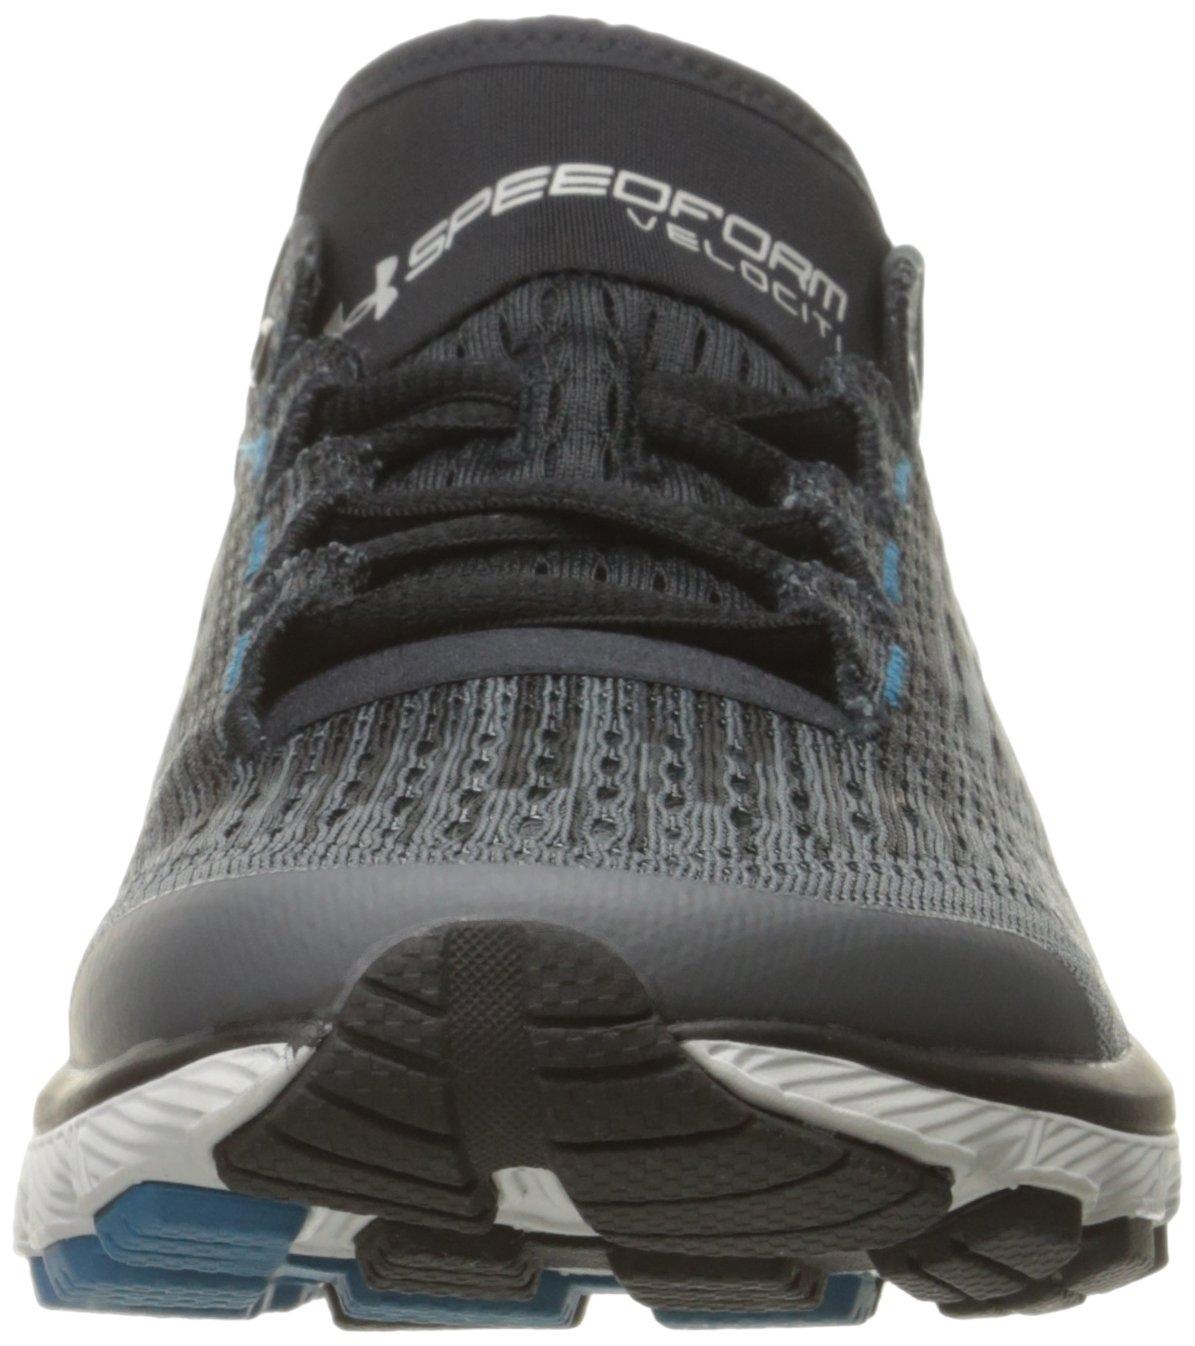 Under Armour Women's Speedform Velociti Graphic Running Shoe B01MXXIT53 5 M US|Rhino Gray (100)/Black